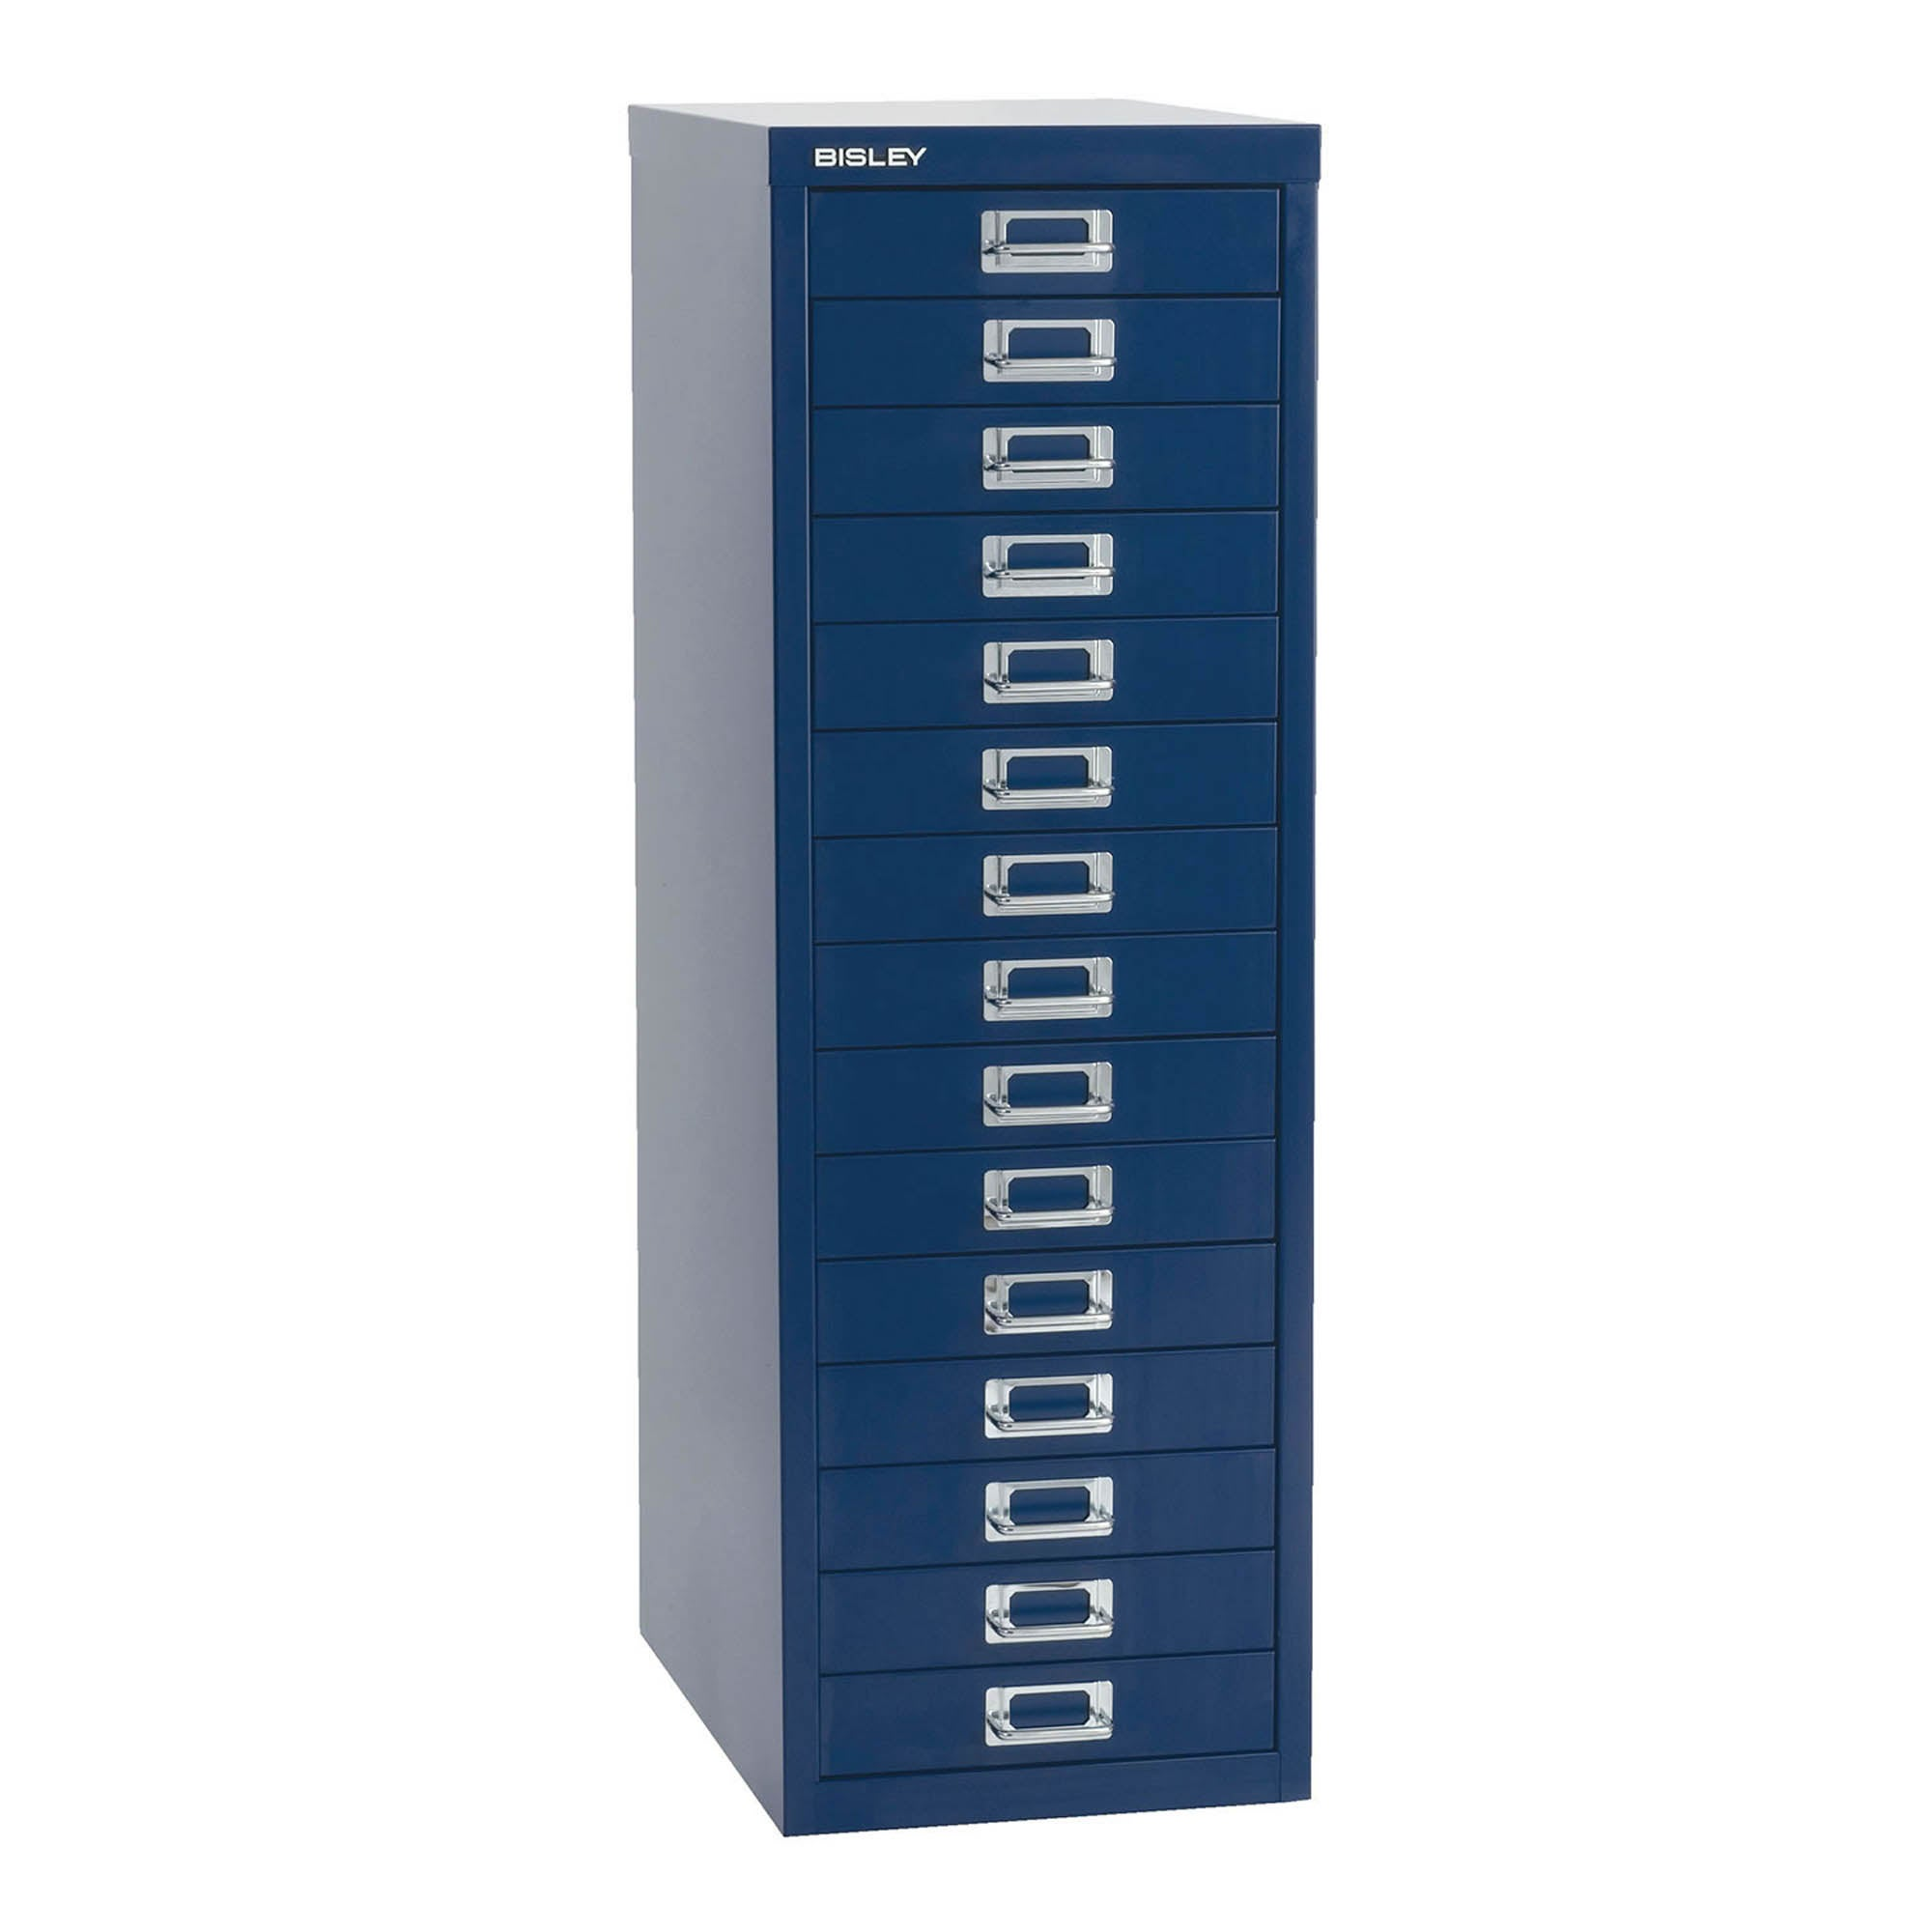 Bisley Metal 15 Drawer Filing Cabinet Navy (Blue)